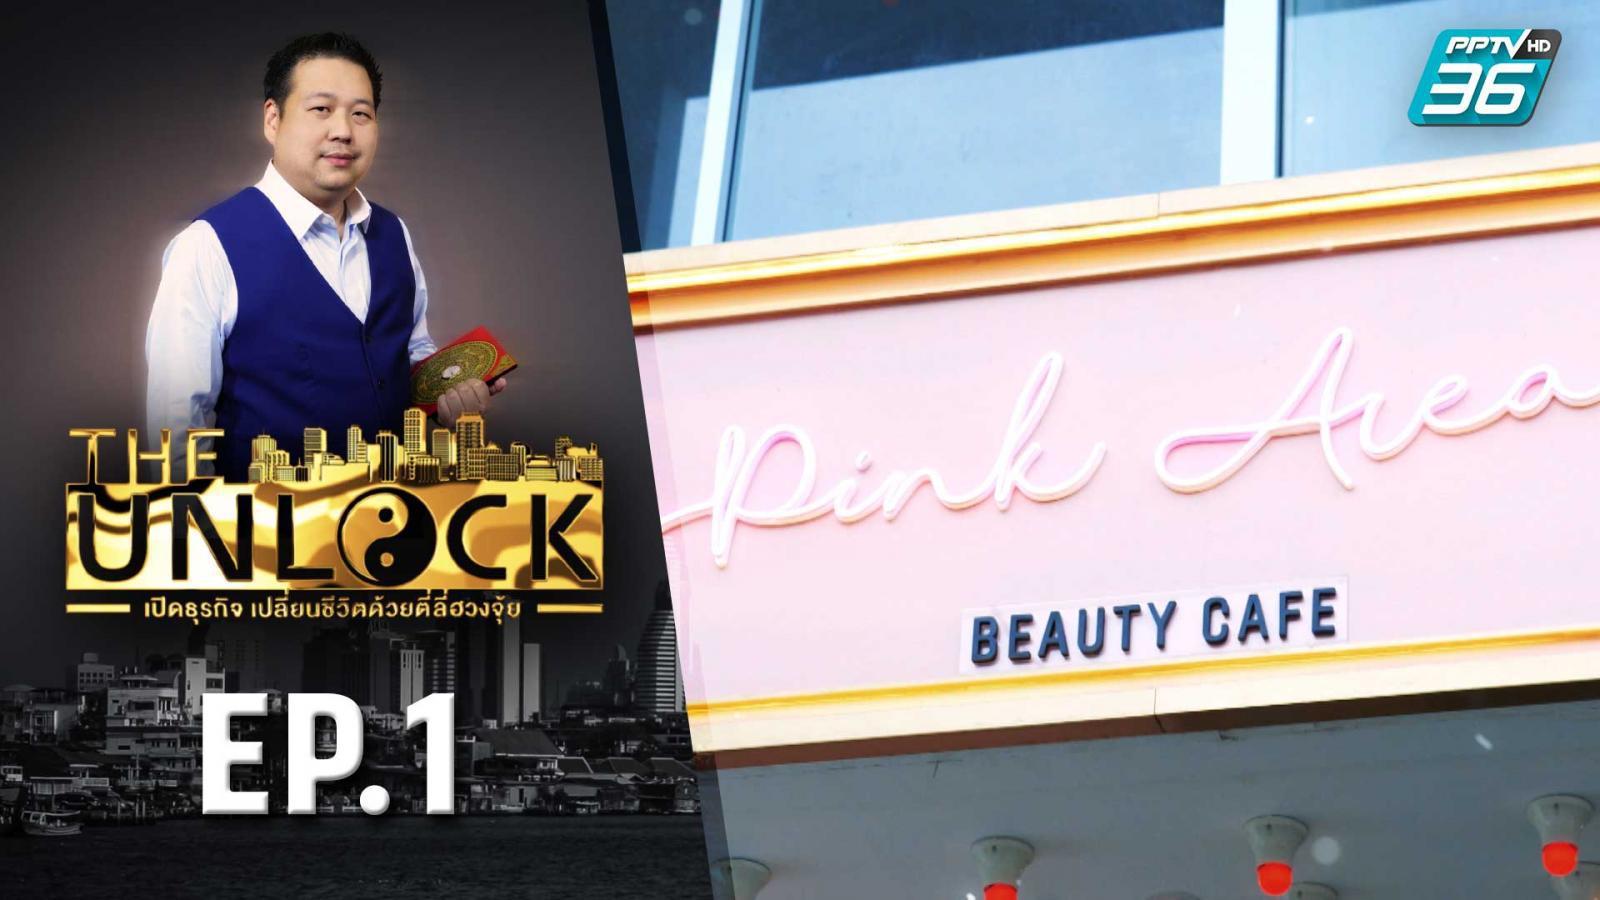 The Unlock เปิดธุรกิจ เปลี่ยนชีวิตด้วยตี่ลี่ฮวงจุ้ย | ตอน Pink Area Beauty Bar & Cafe EP.1 | PPTV HD 36